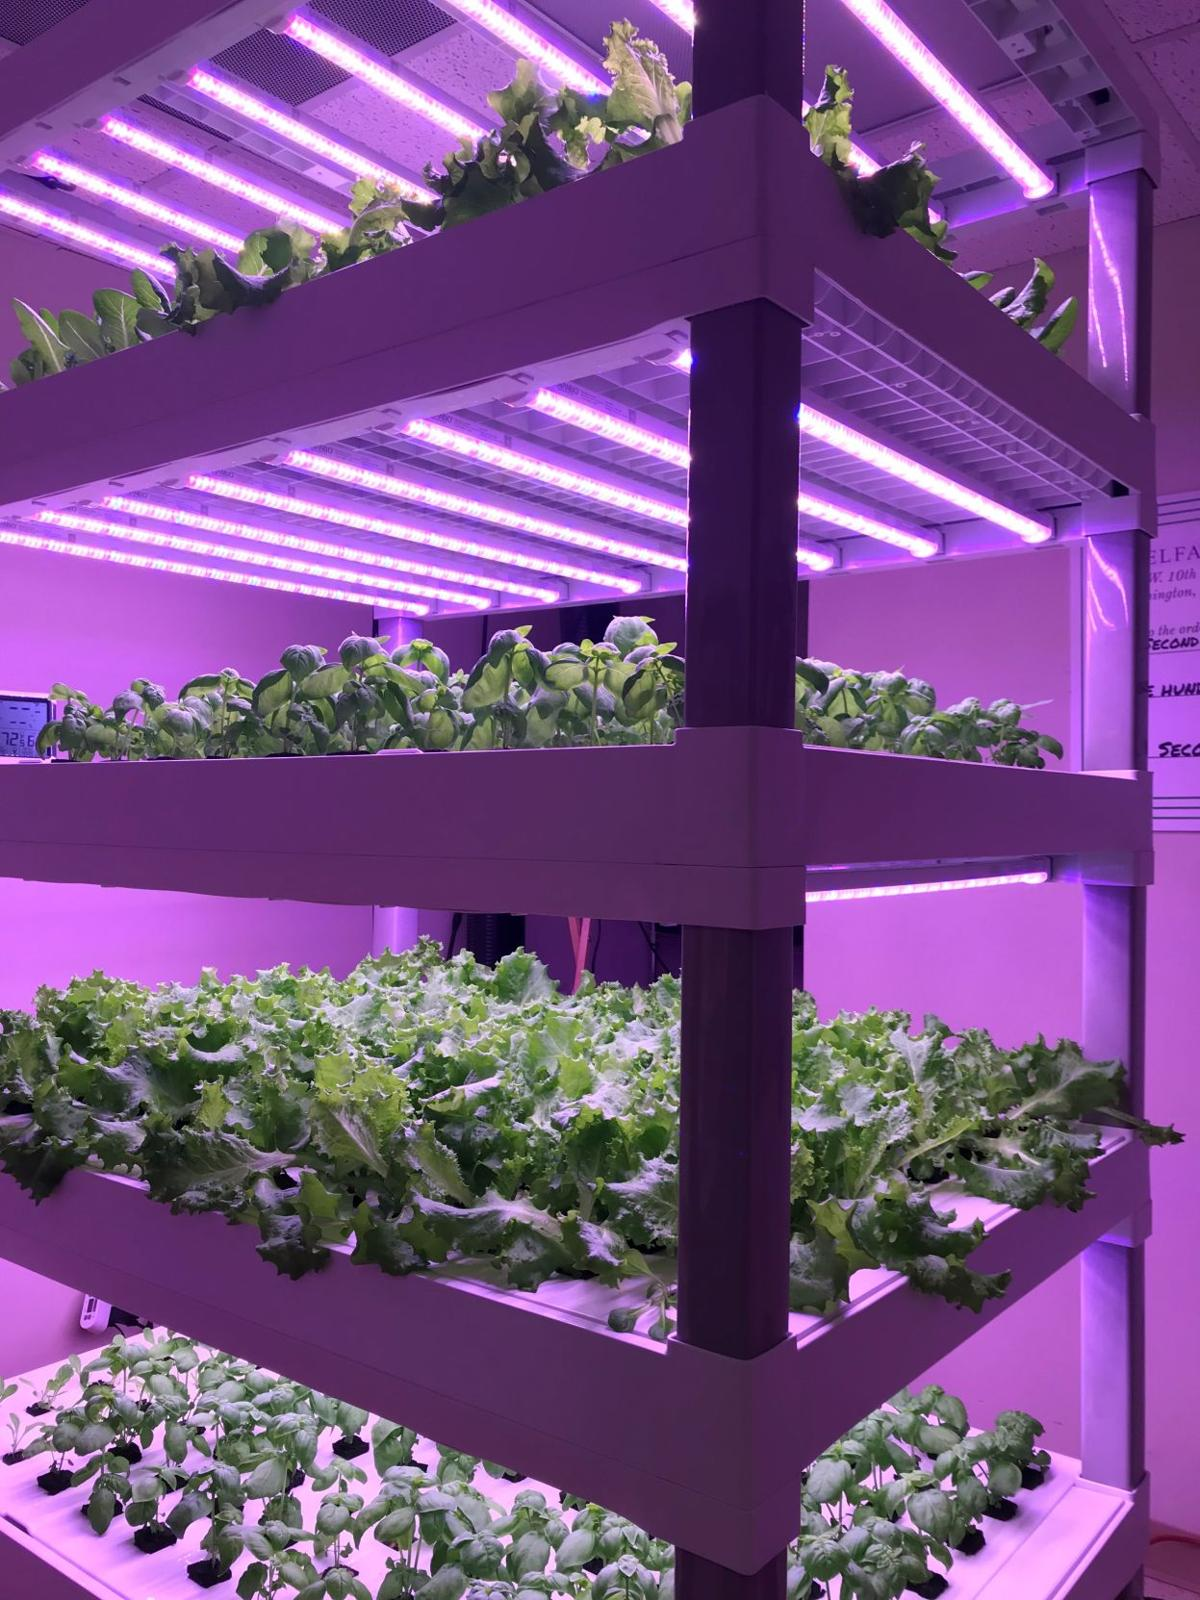 WLM vertical indoor farm